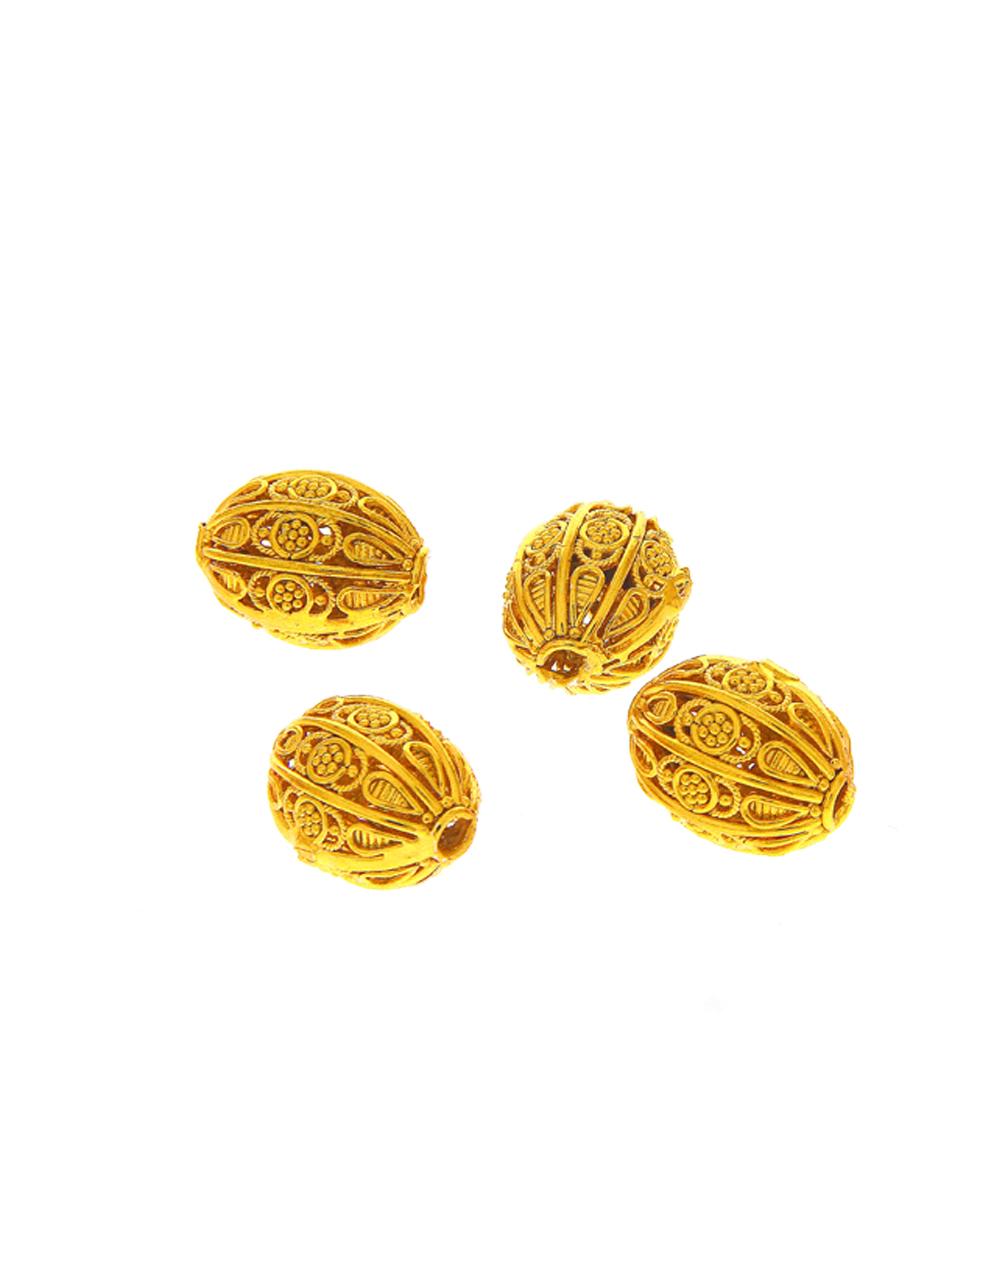 Fashionable Gold Making Jewellery